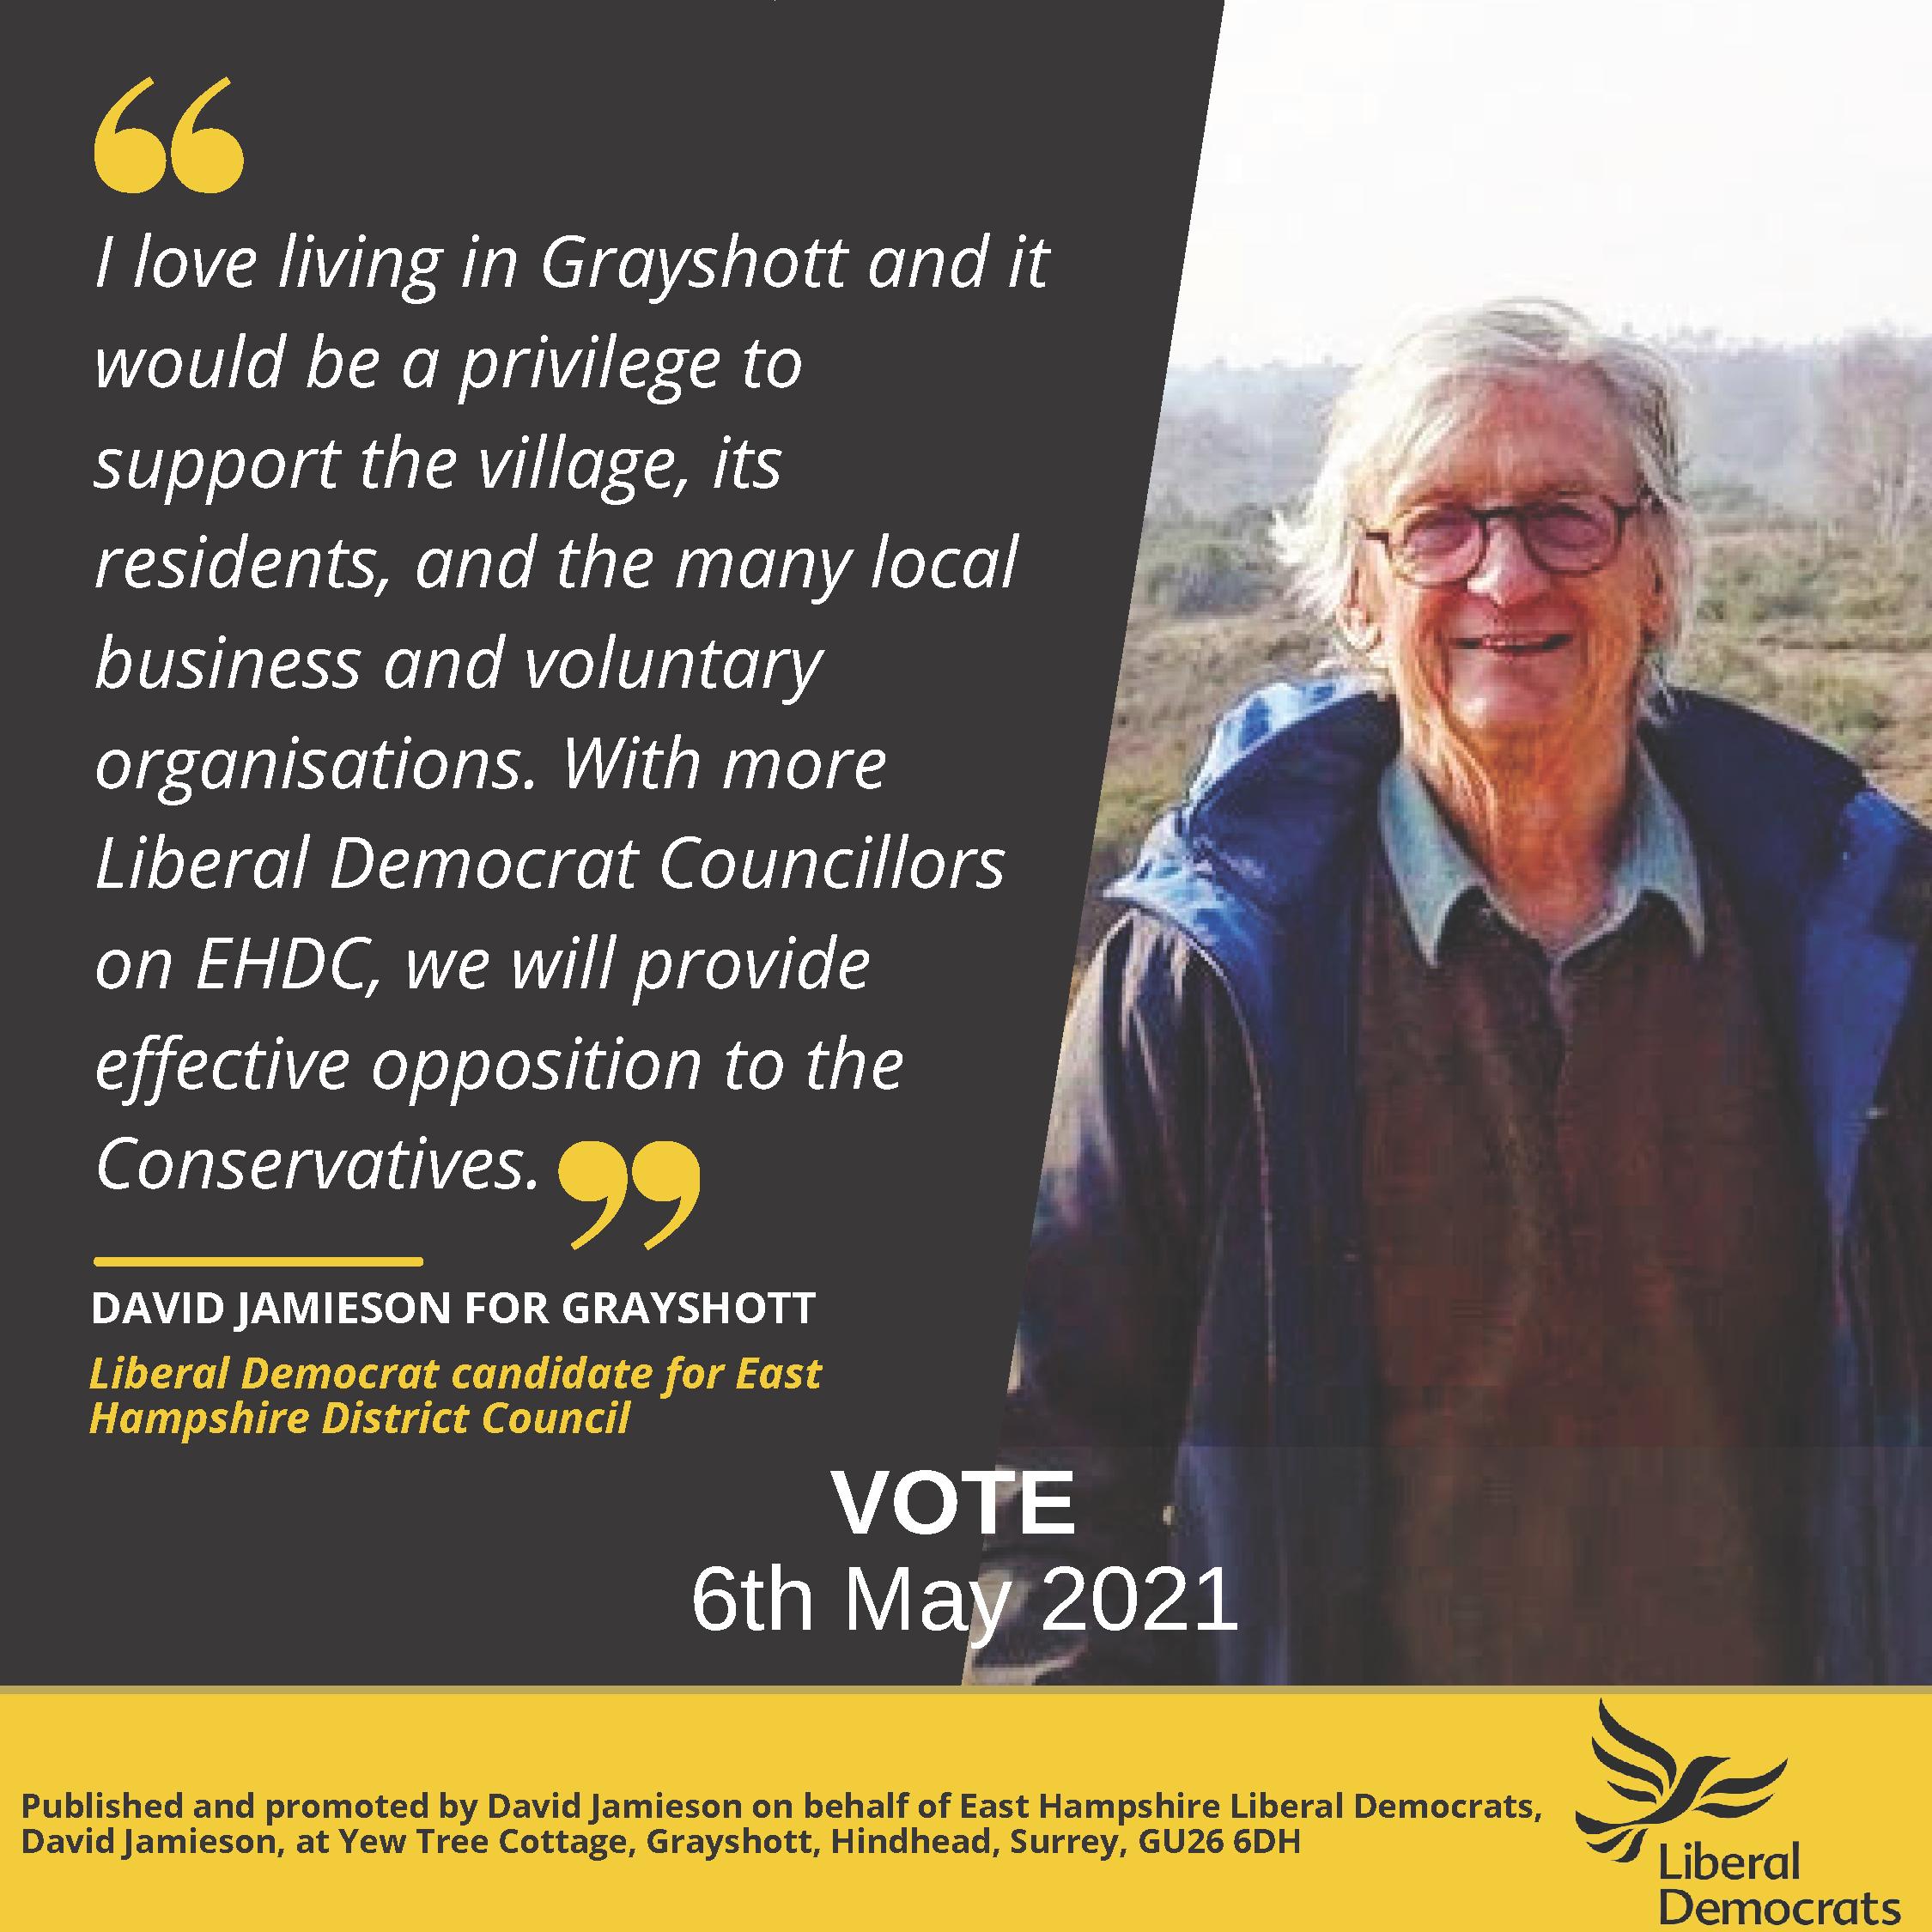 David_J_Grayshott_campaign.png